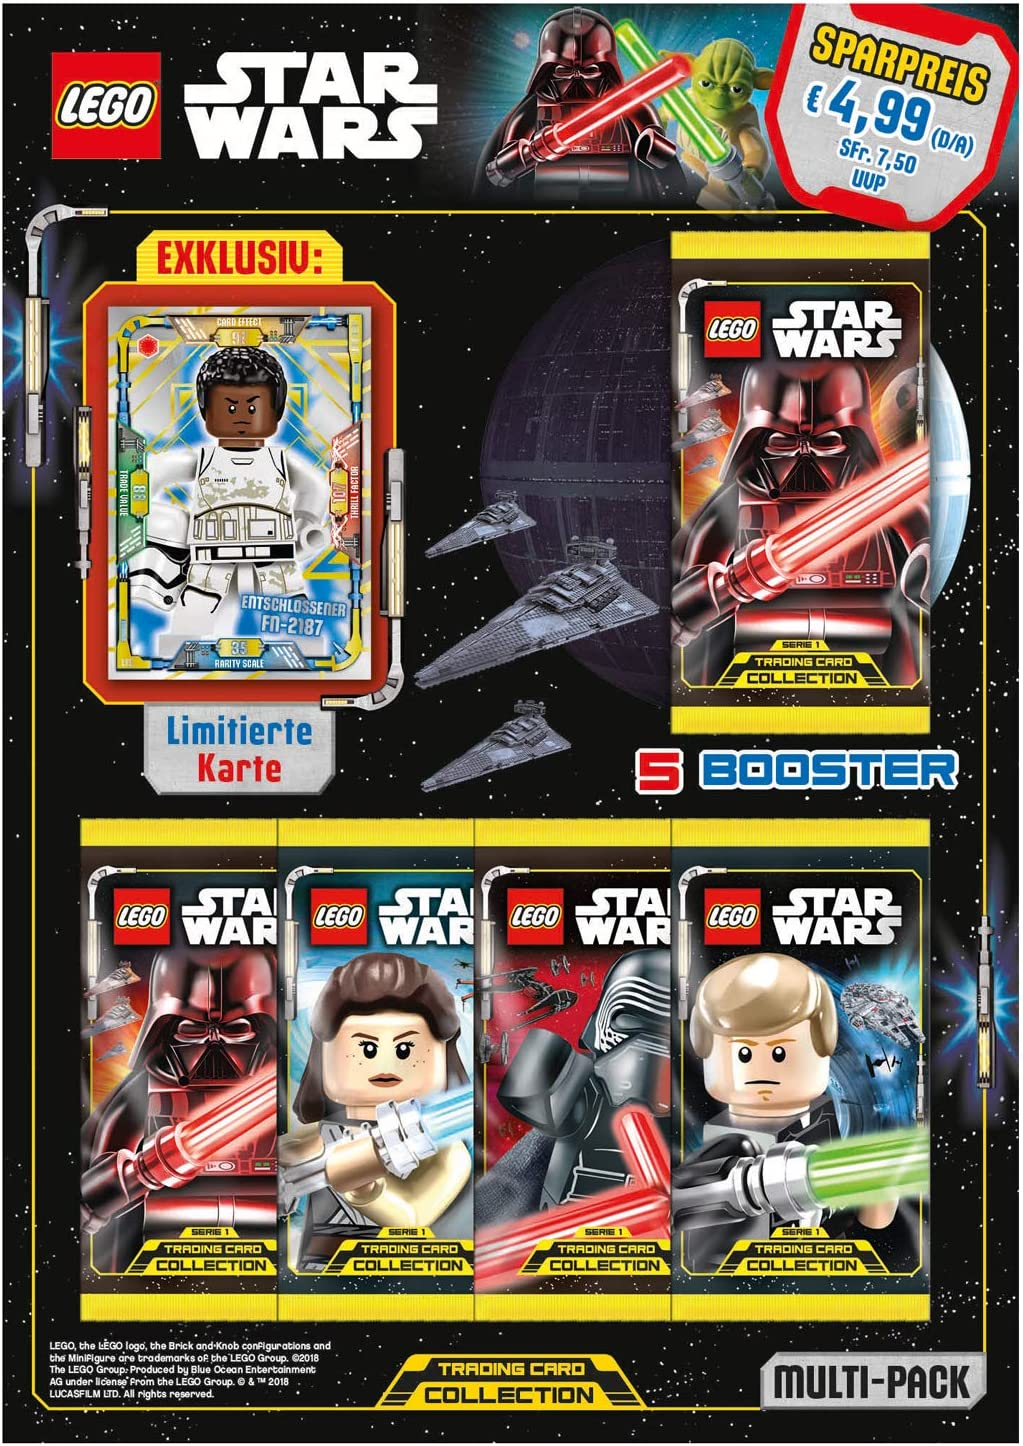 Top Media 180248 Lego Star Wars Cartas coleccionables, Multi Pack ...